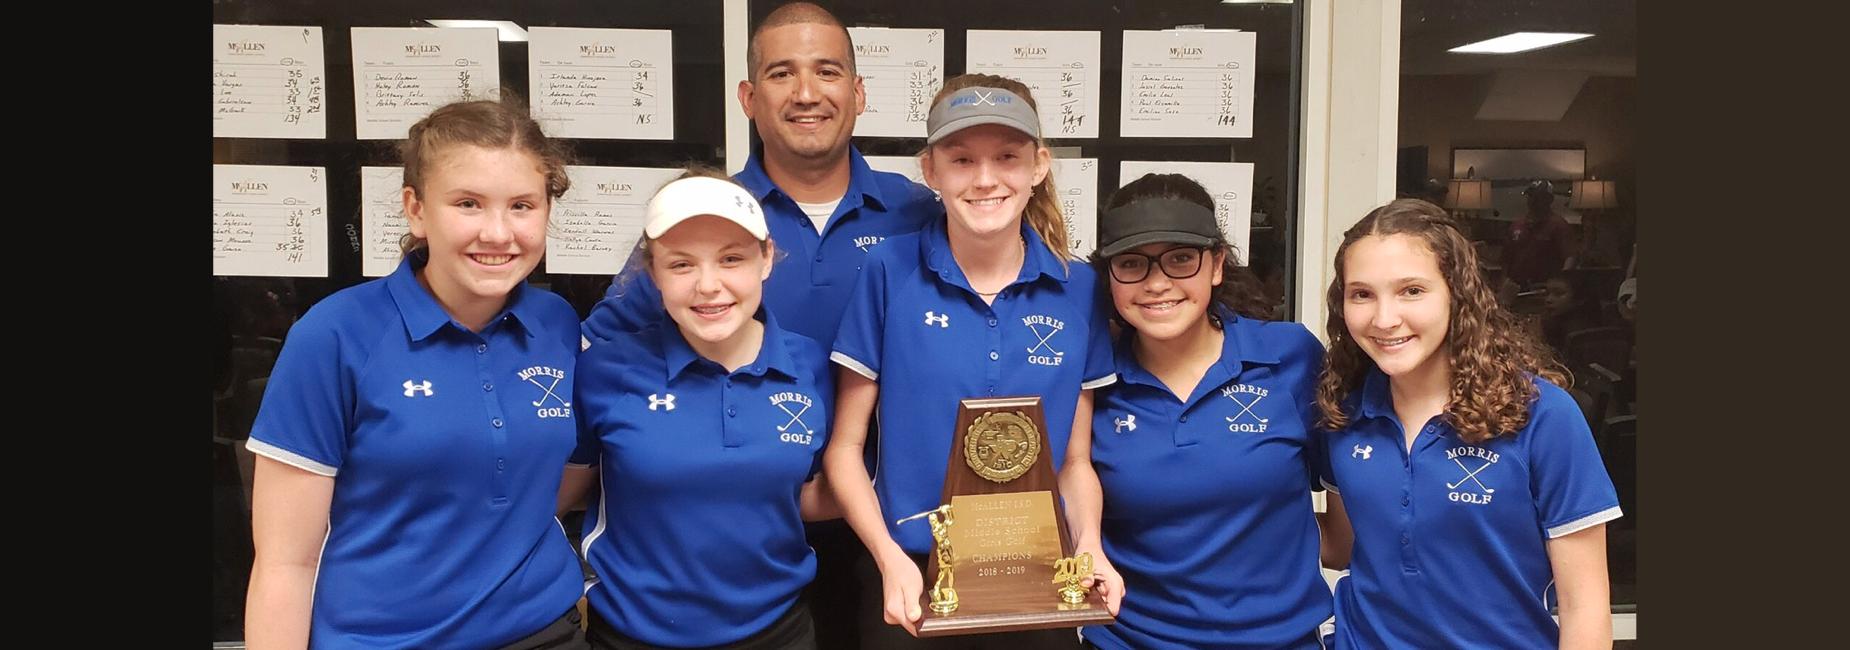 Girls Golf District Champions